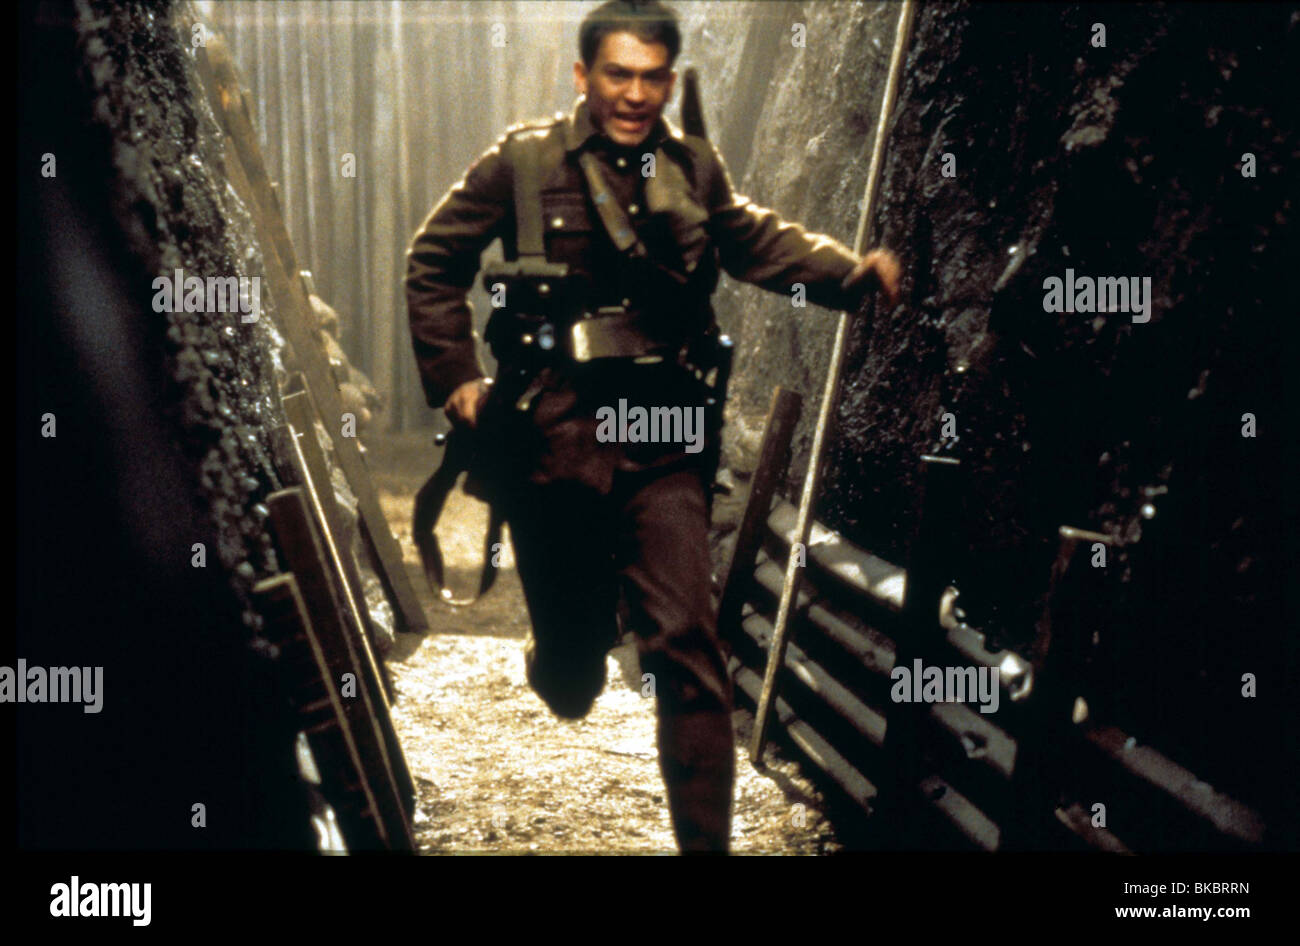 THE TRENCH(1999) PAUL NICHOLLS - Stock Image